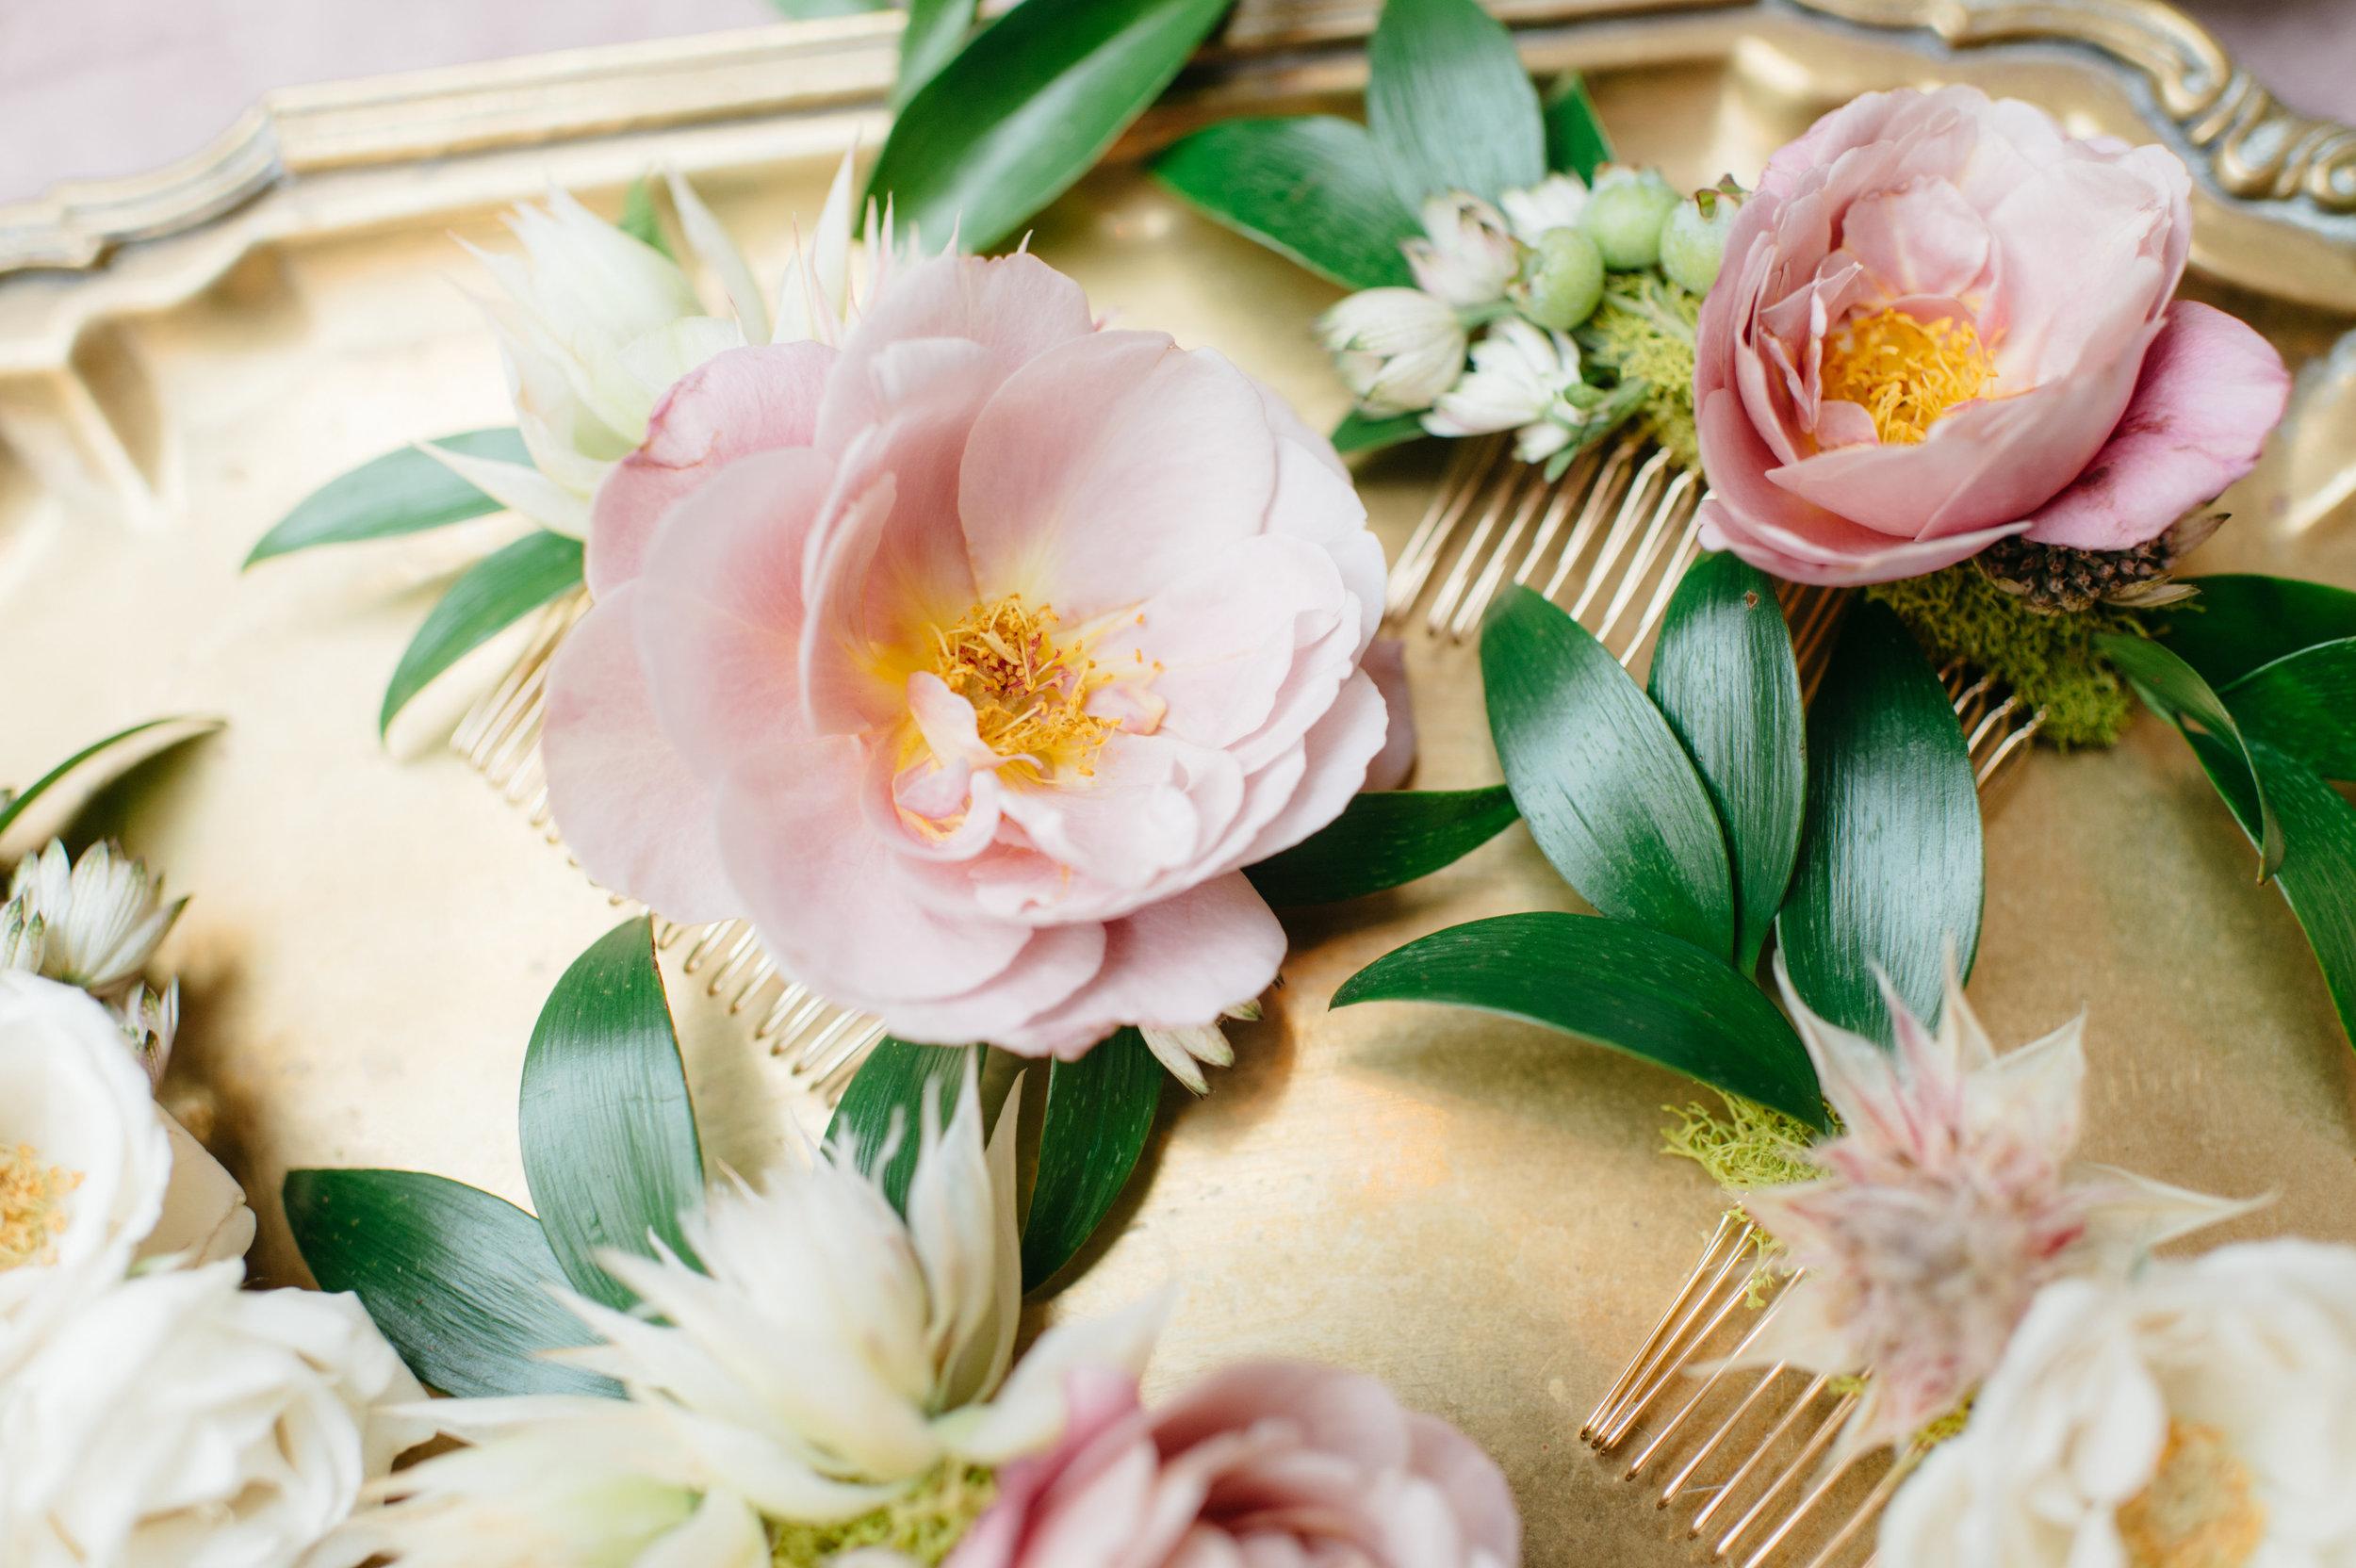 custom wedding planners michigan event design paper goods florals hairpiece